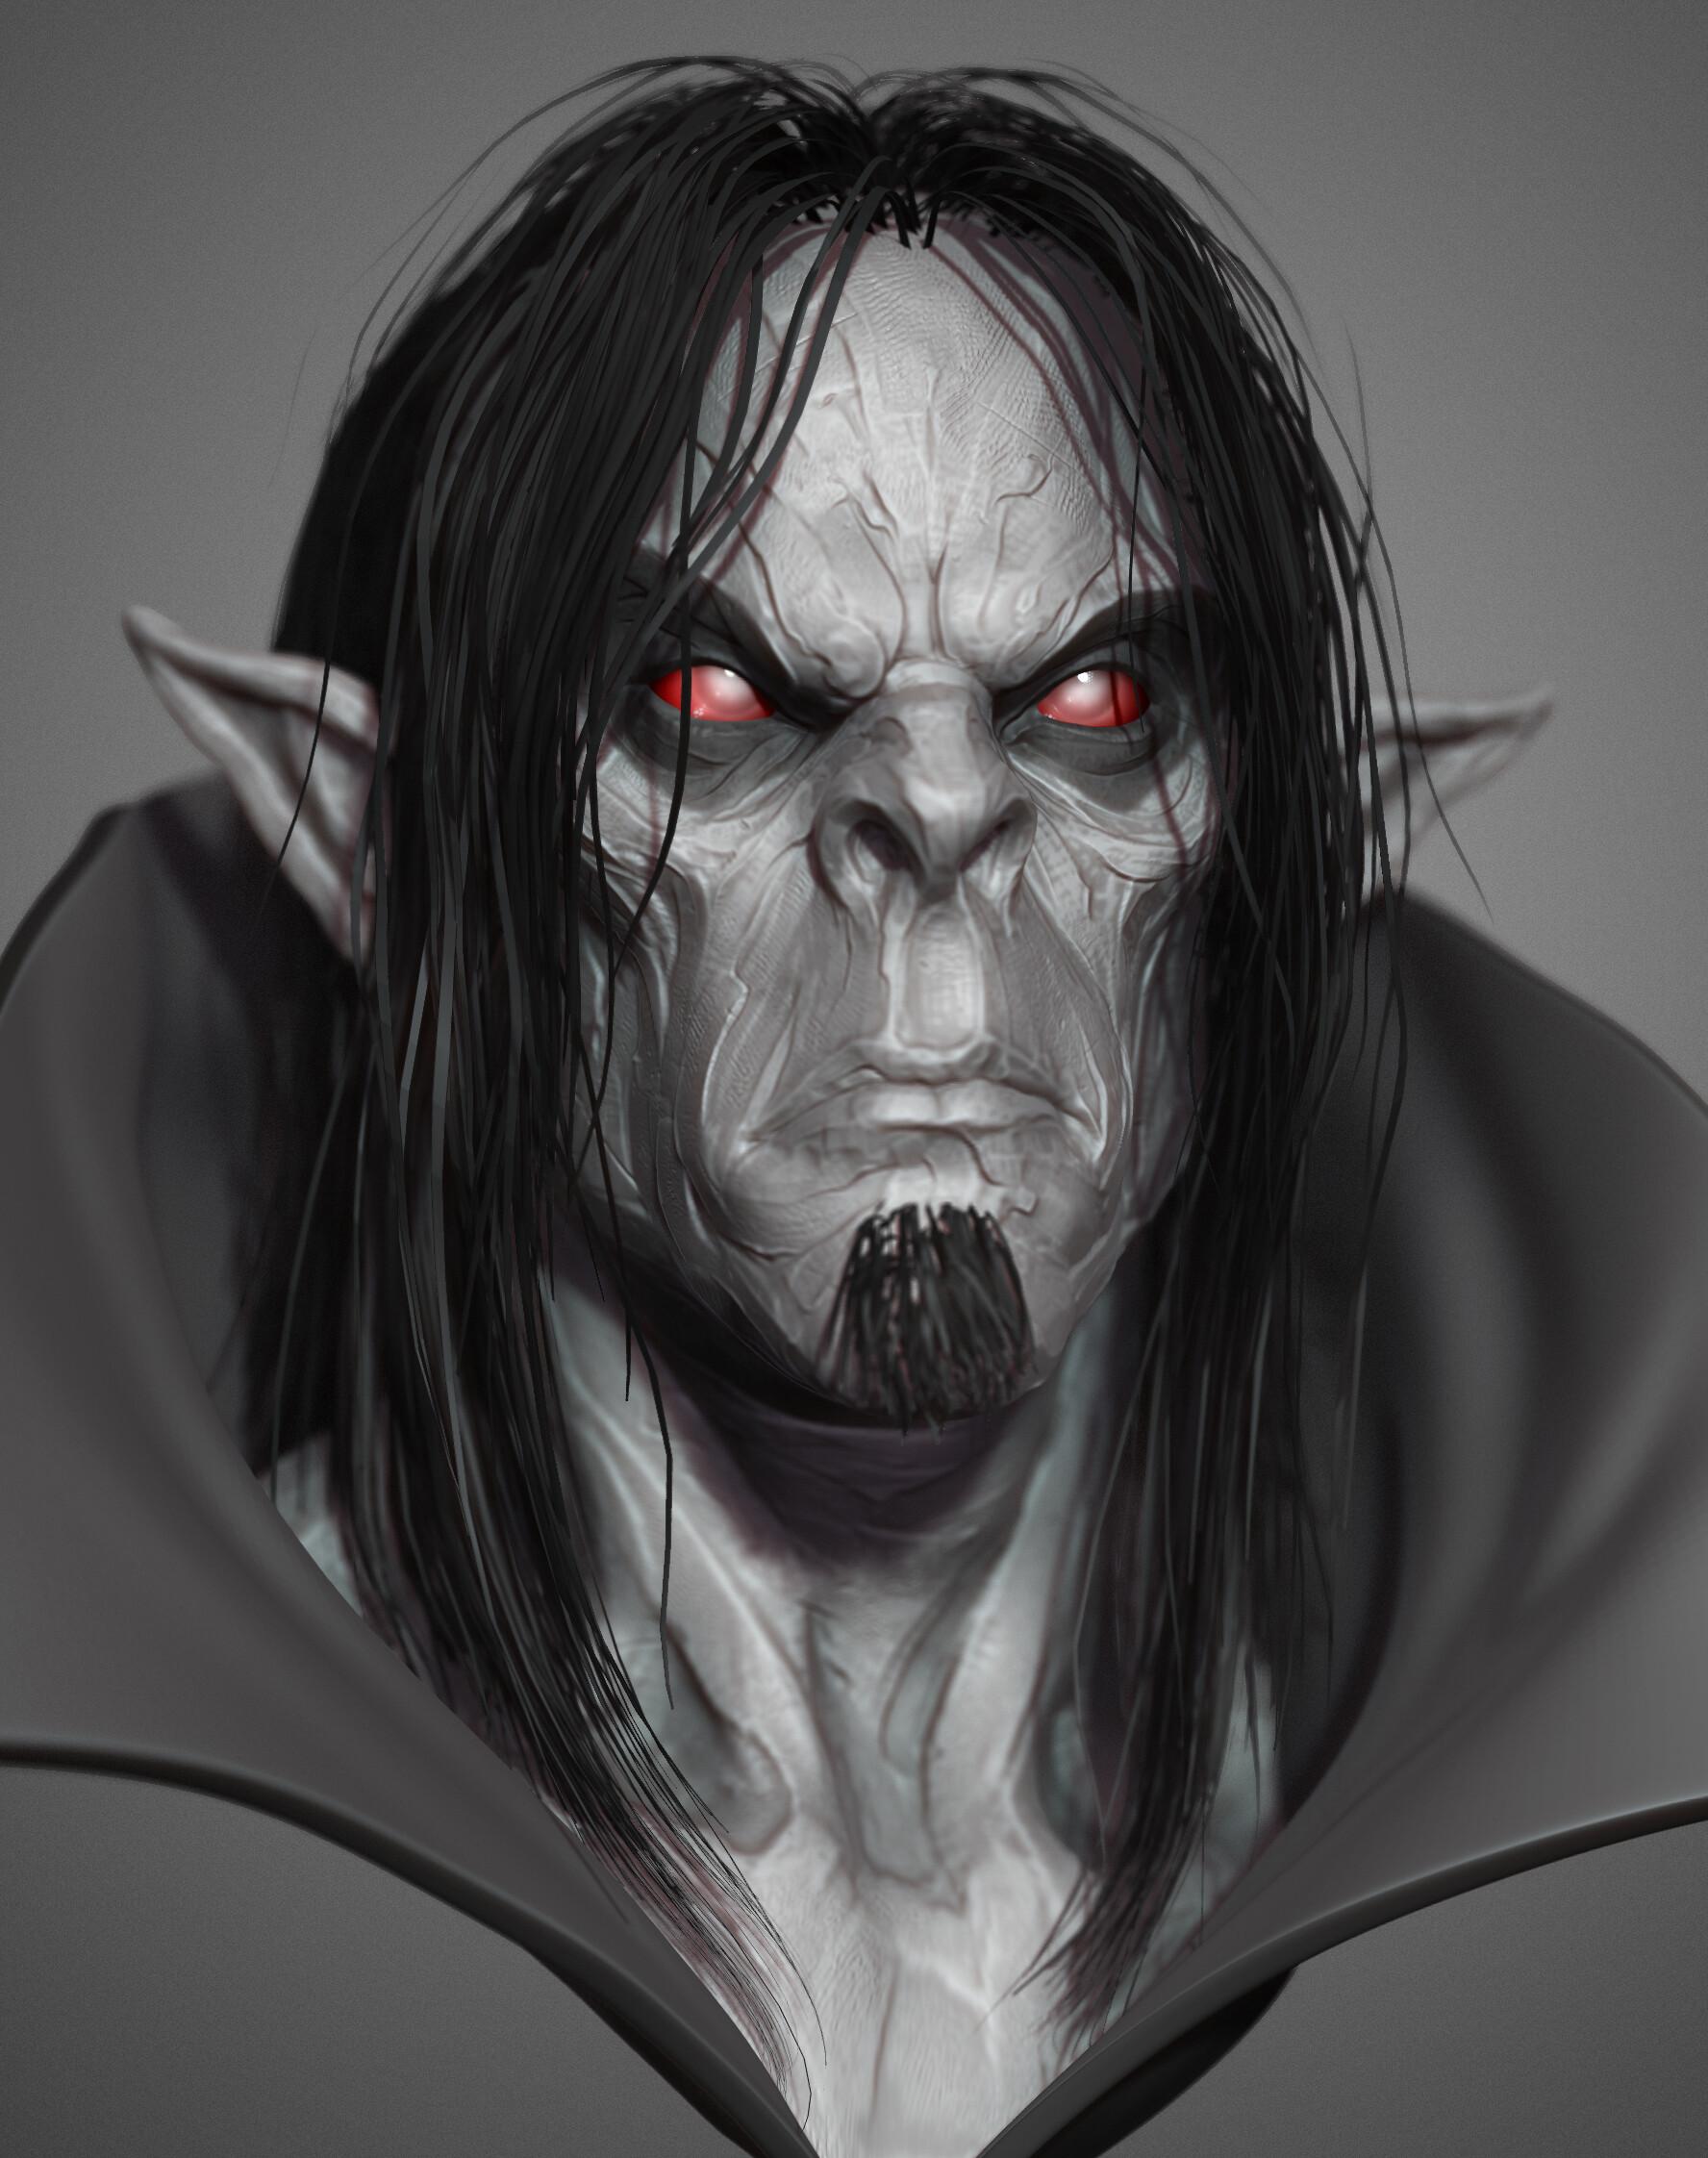 Poligone cg morbius 2